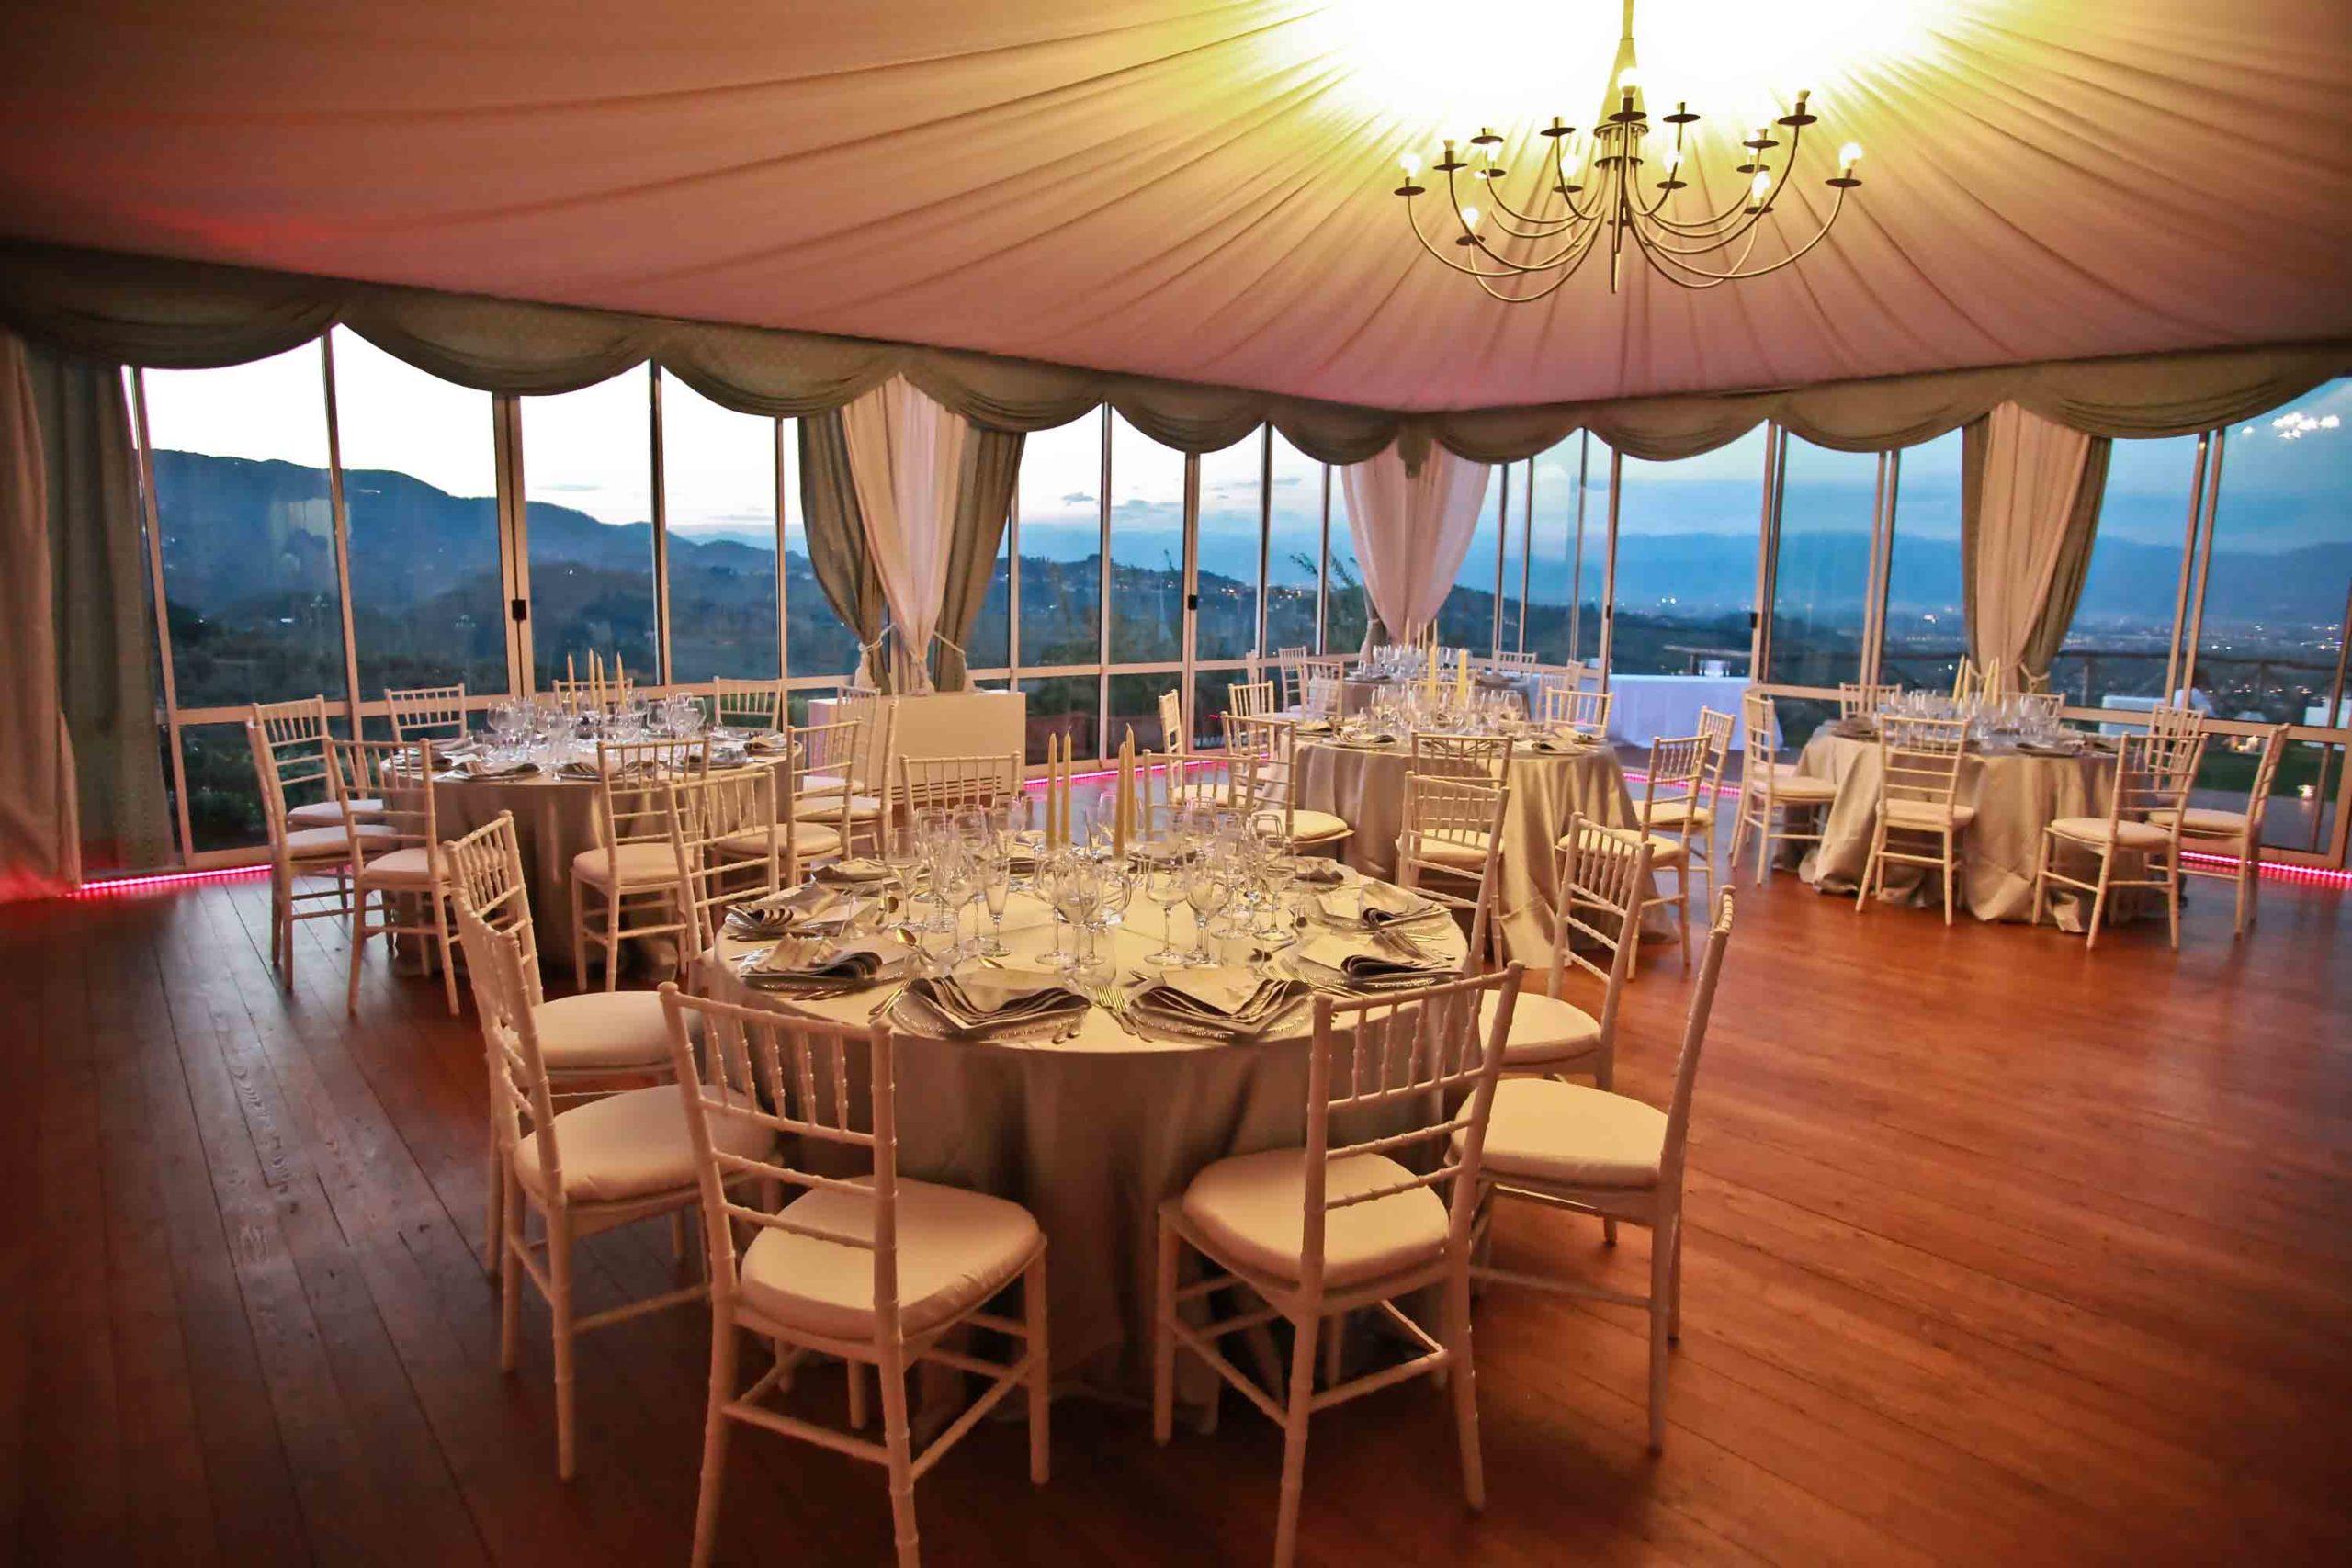 vista-dal-interno-gazebo-allestimento-wedding-ristorante